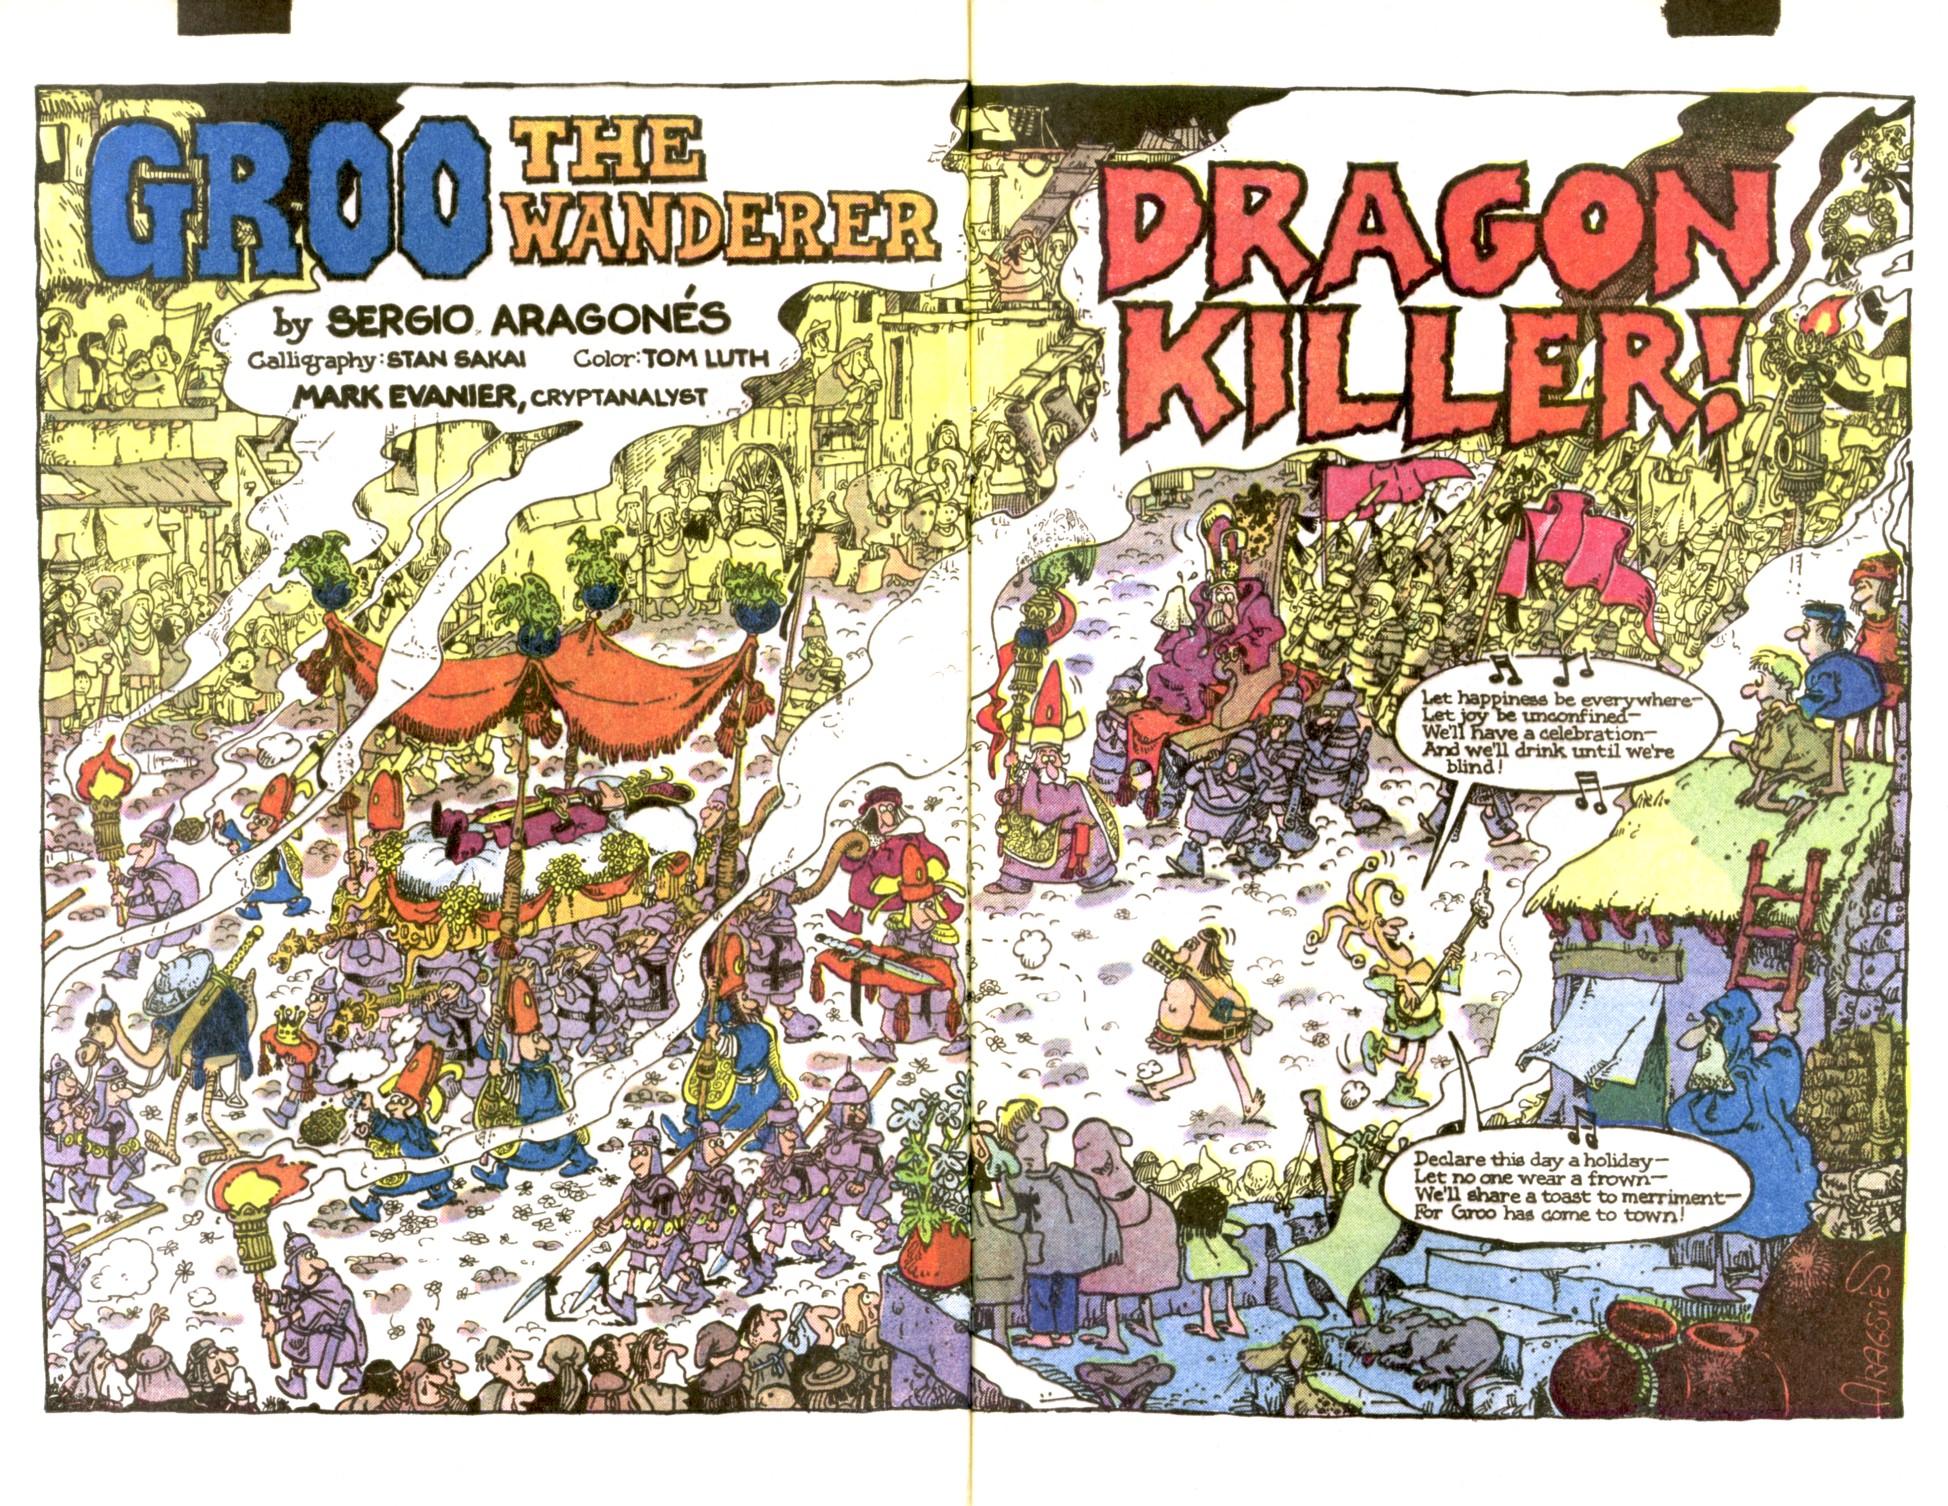 Read online Sergio Aragonés Groo the Wanderer comic -  Issue #2 - 3